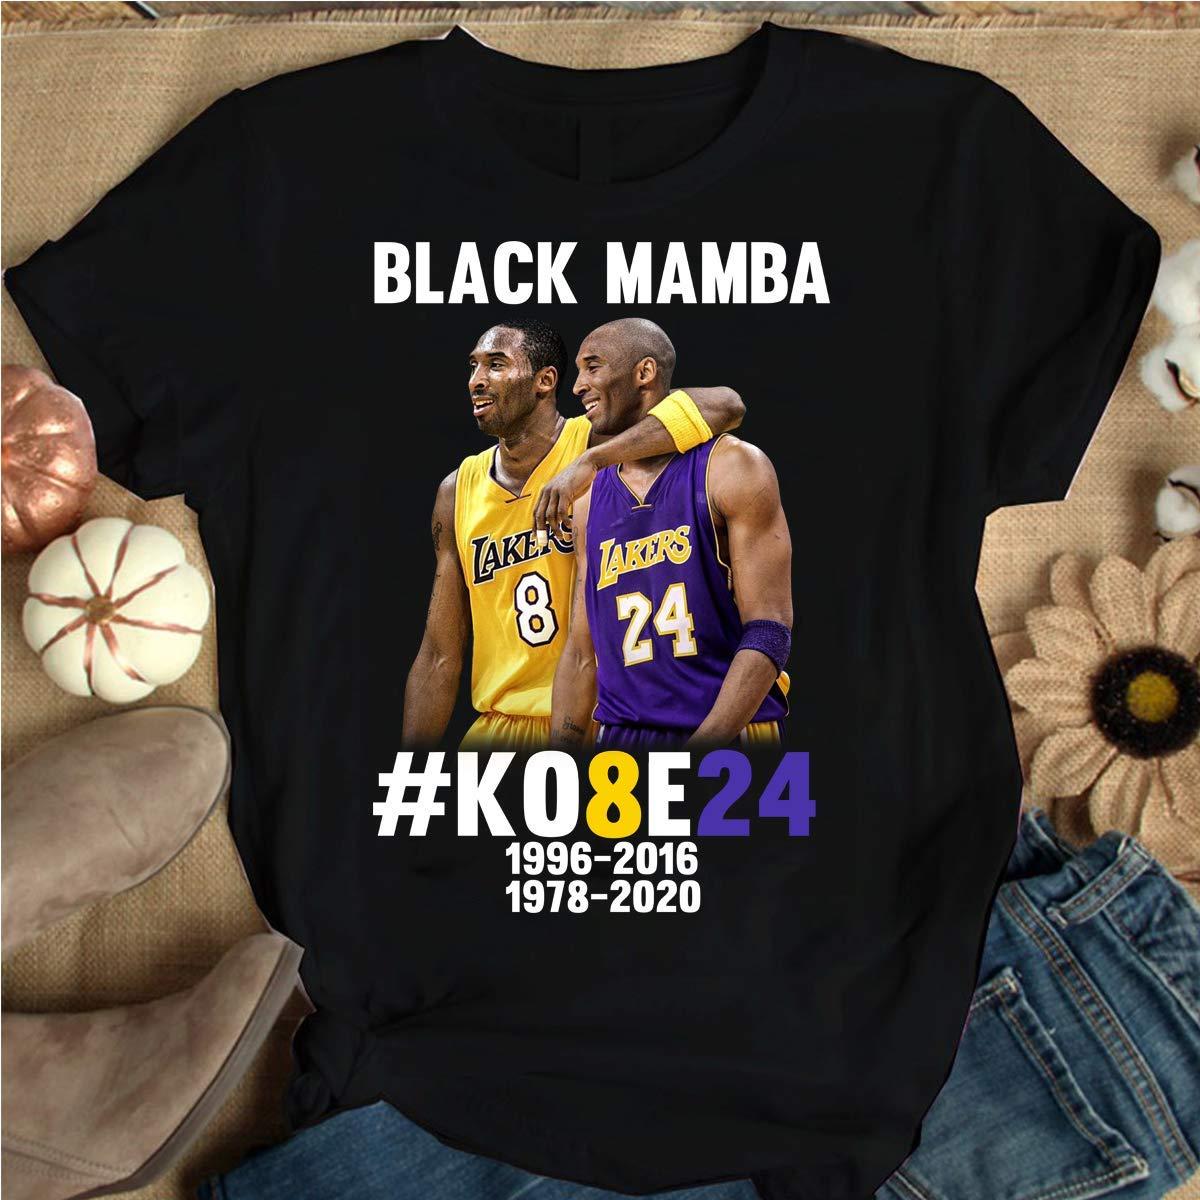 Rip-Kobe Legend Black Mamba Remembrance Mens Hoodie Stylish Sweatshirt